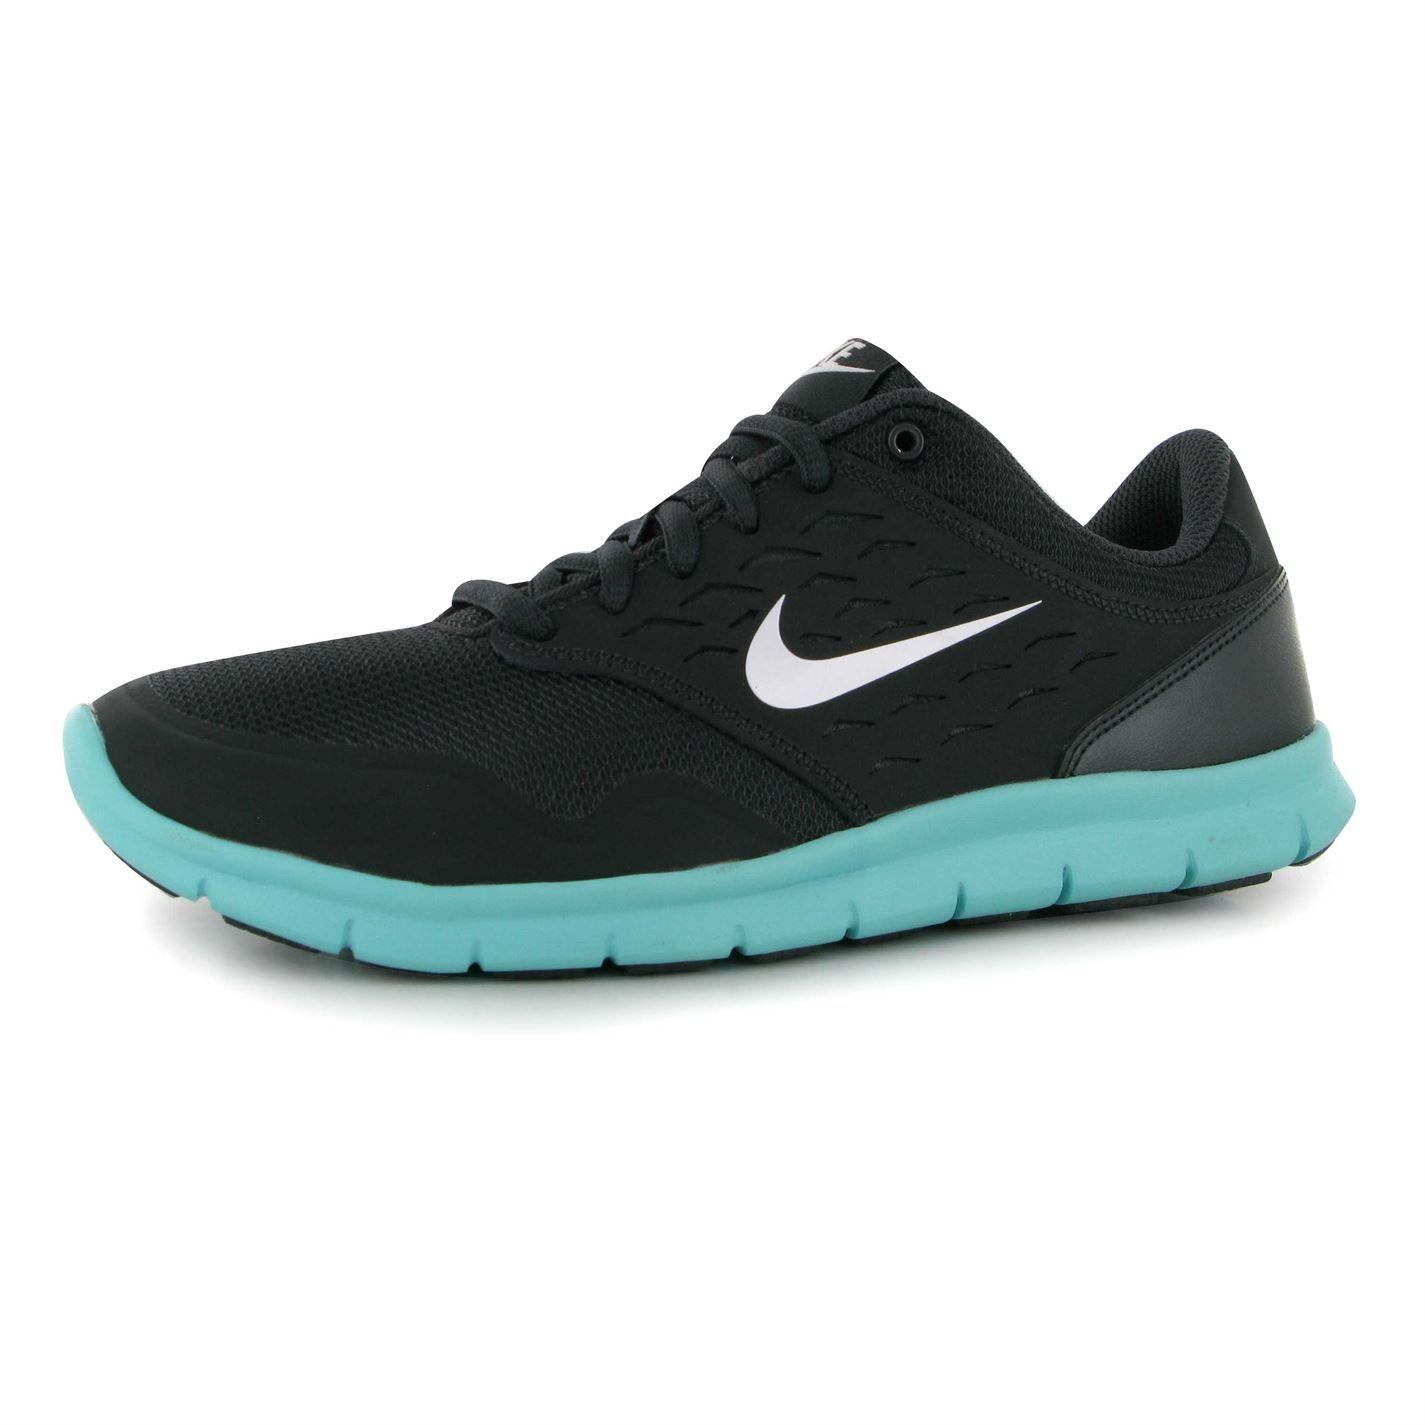 Nike Orive Ld44 shoes Pinterest Ladies